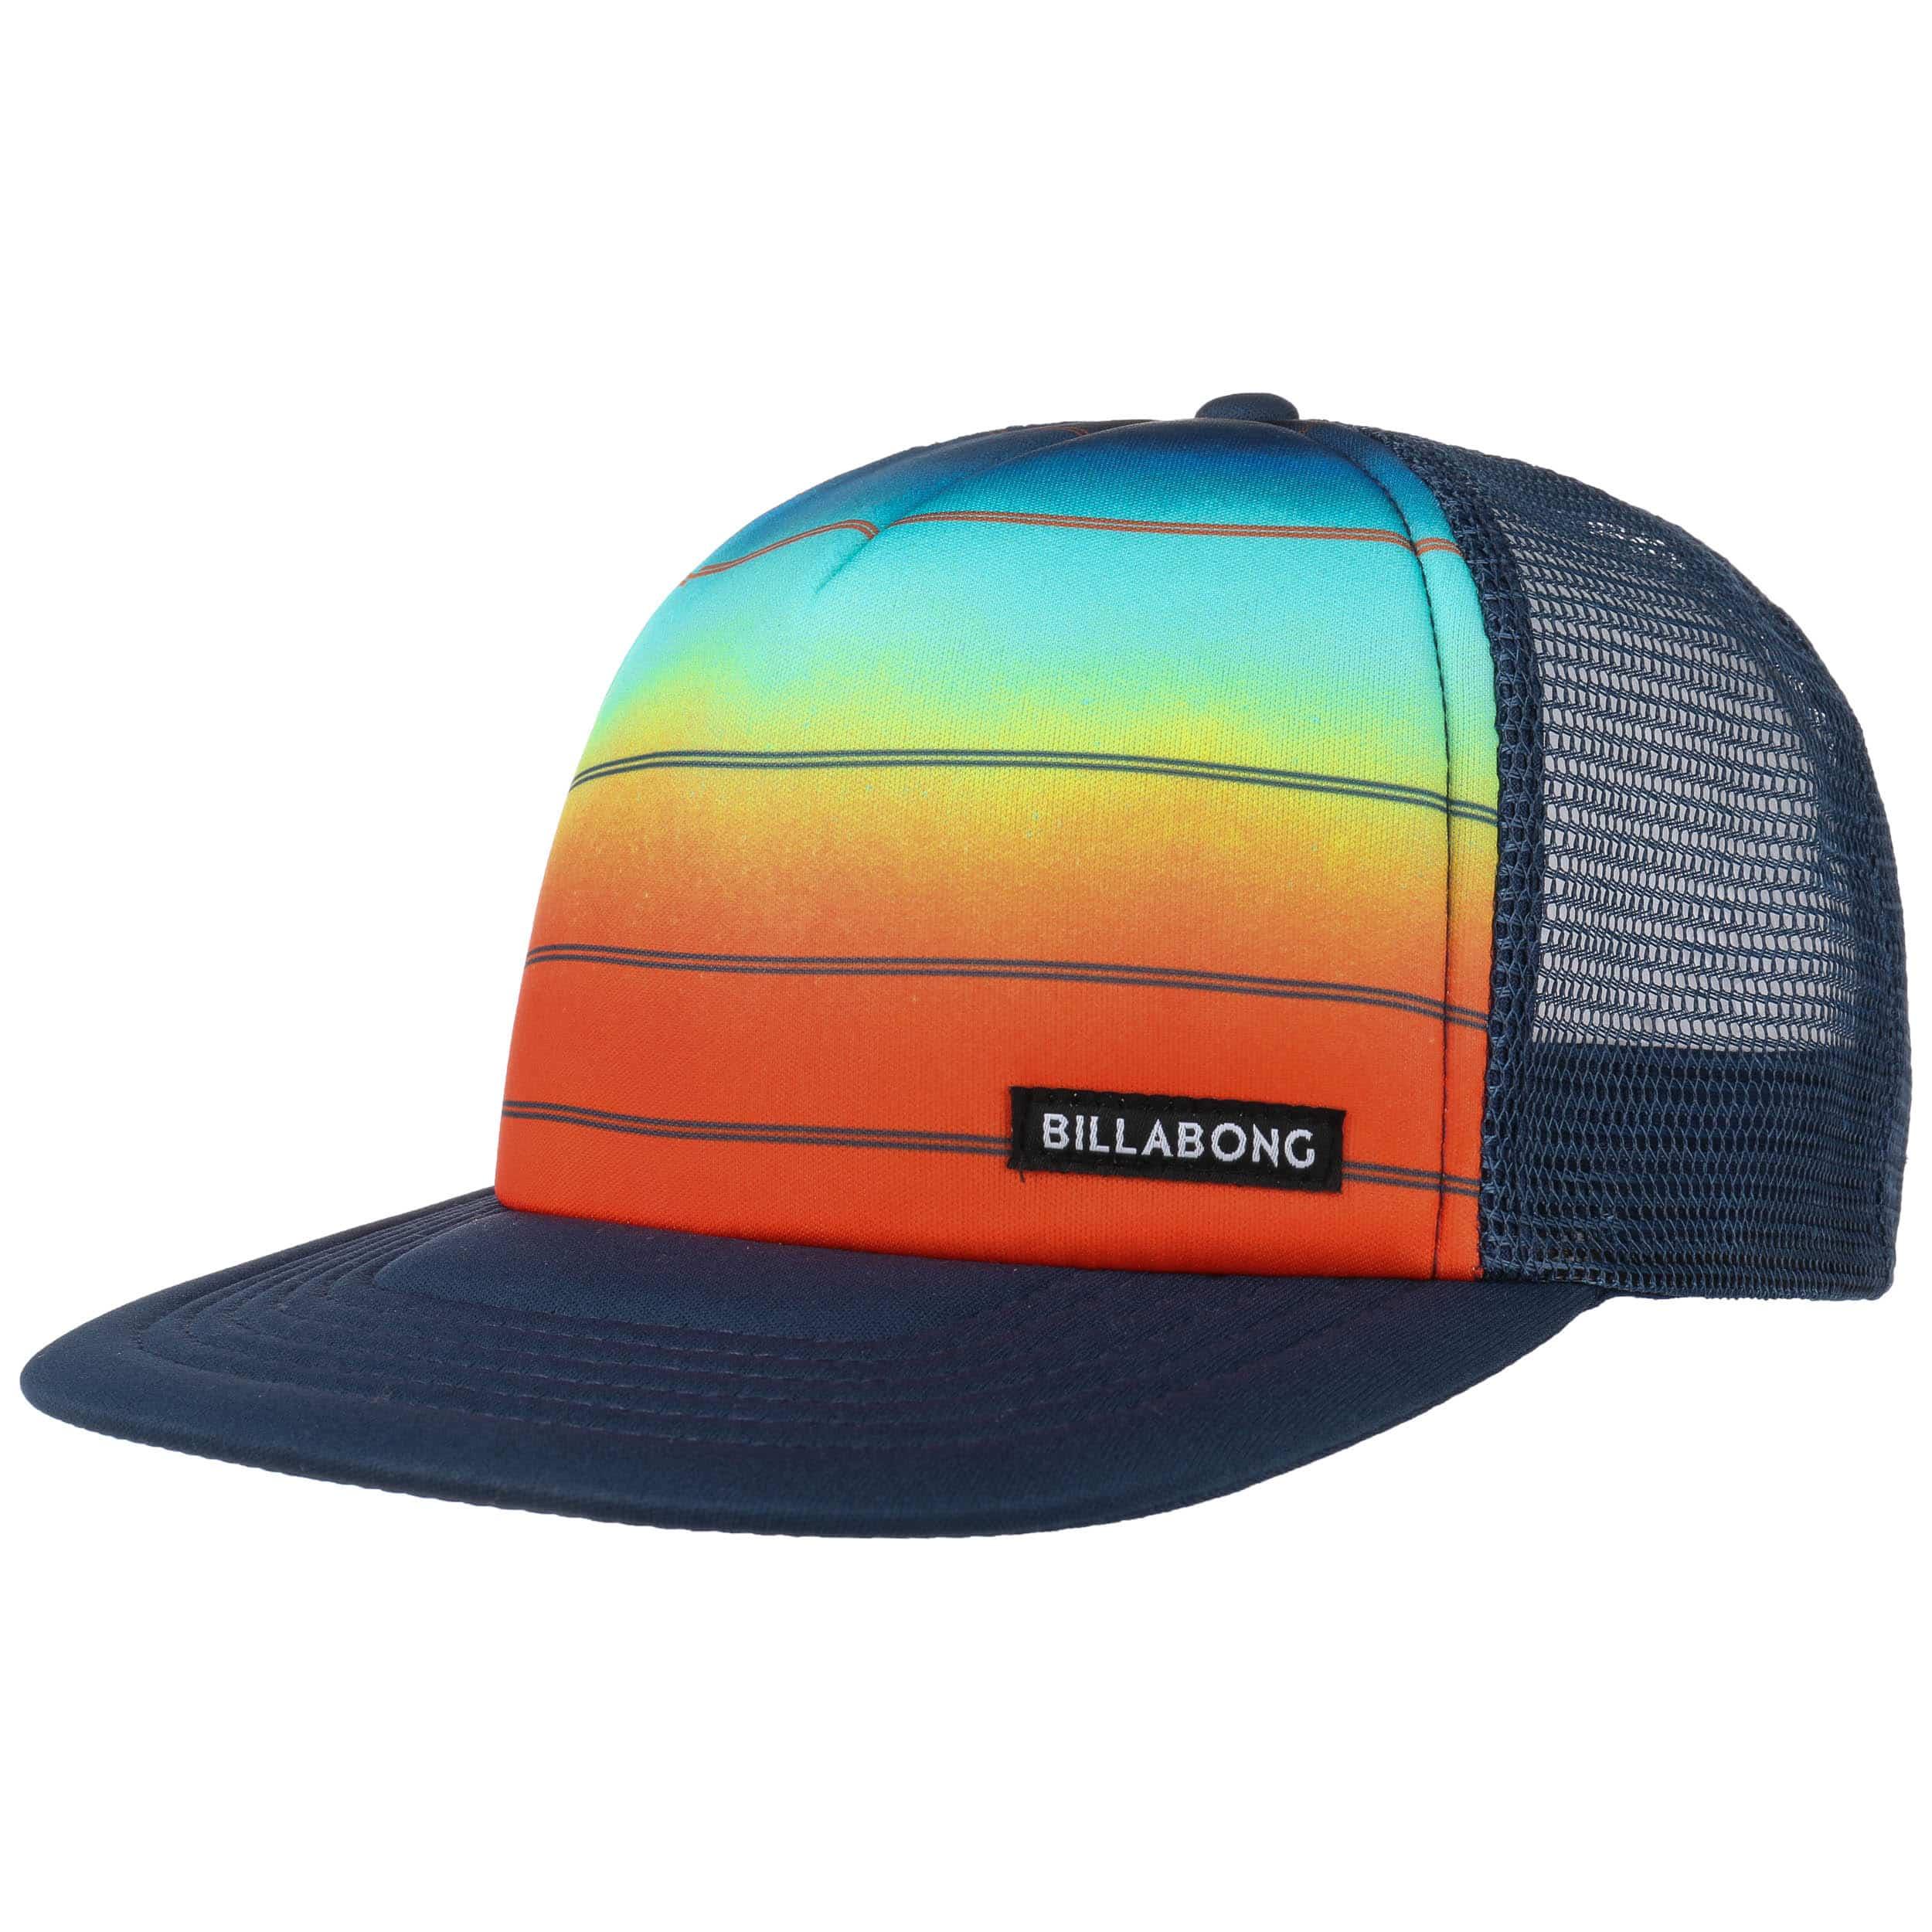 ... Cappellino 73 Trucker by Billabong - blu scuro 6 ... 9c635e6b8437